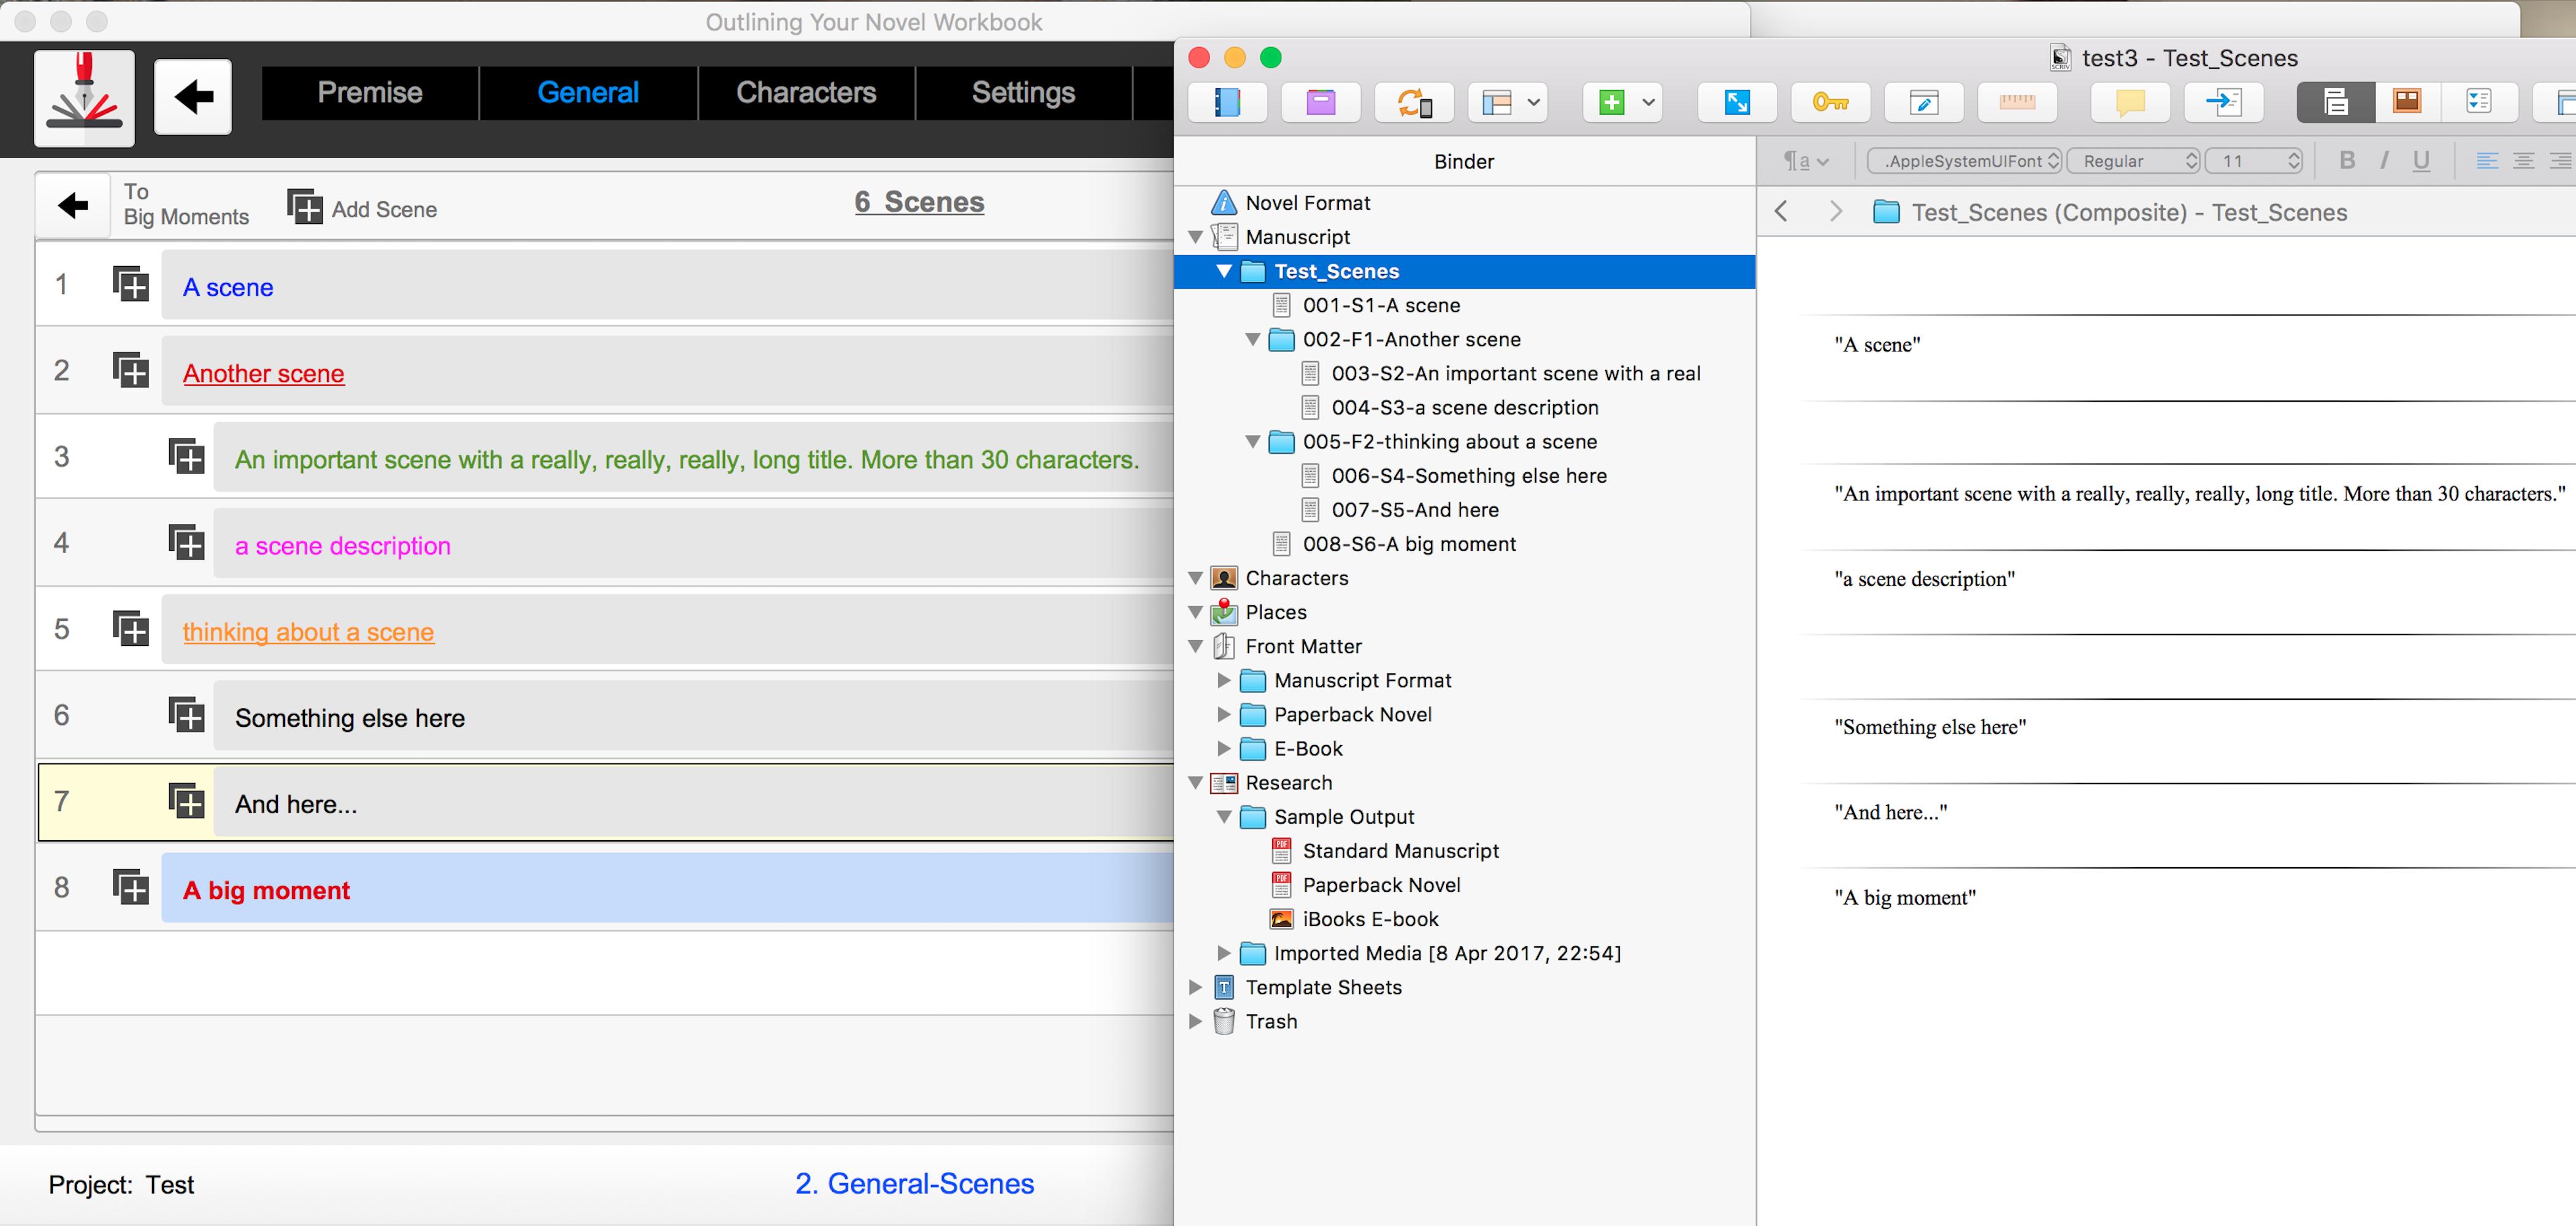 Outlining Your Novel Workbook Computer Program Export to Scrivener